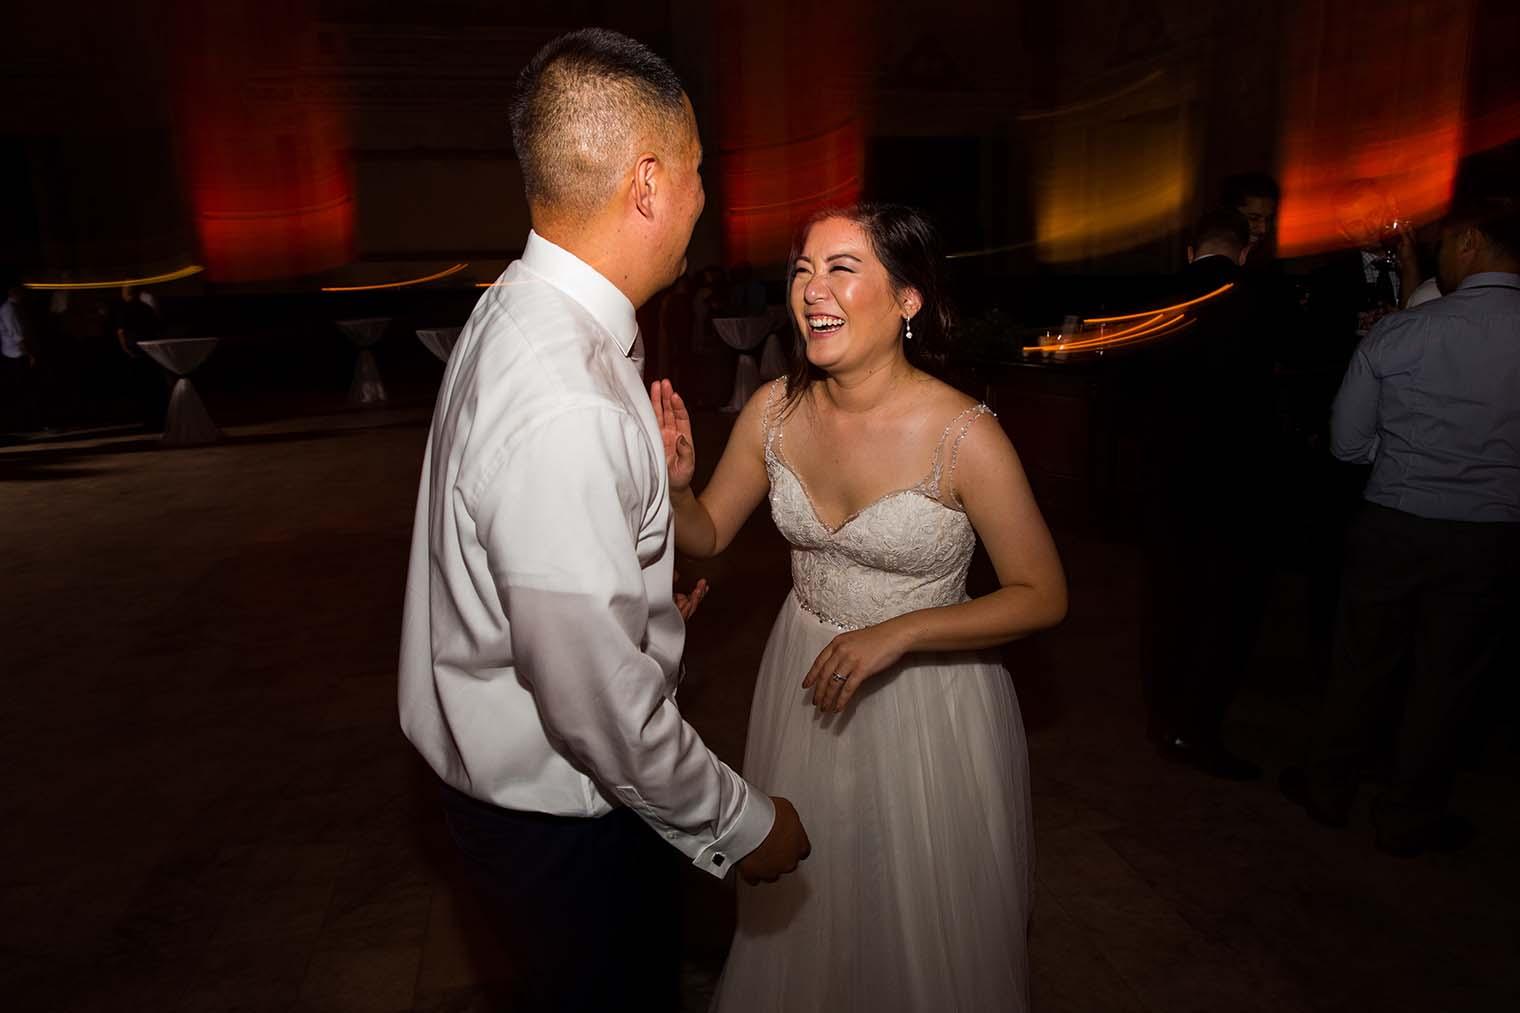 16th Street Station Wedding Reception